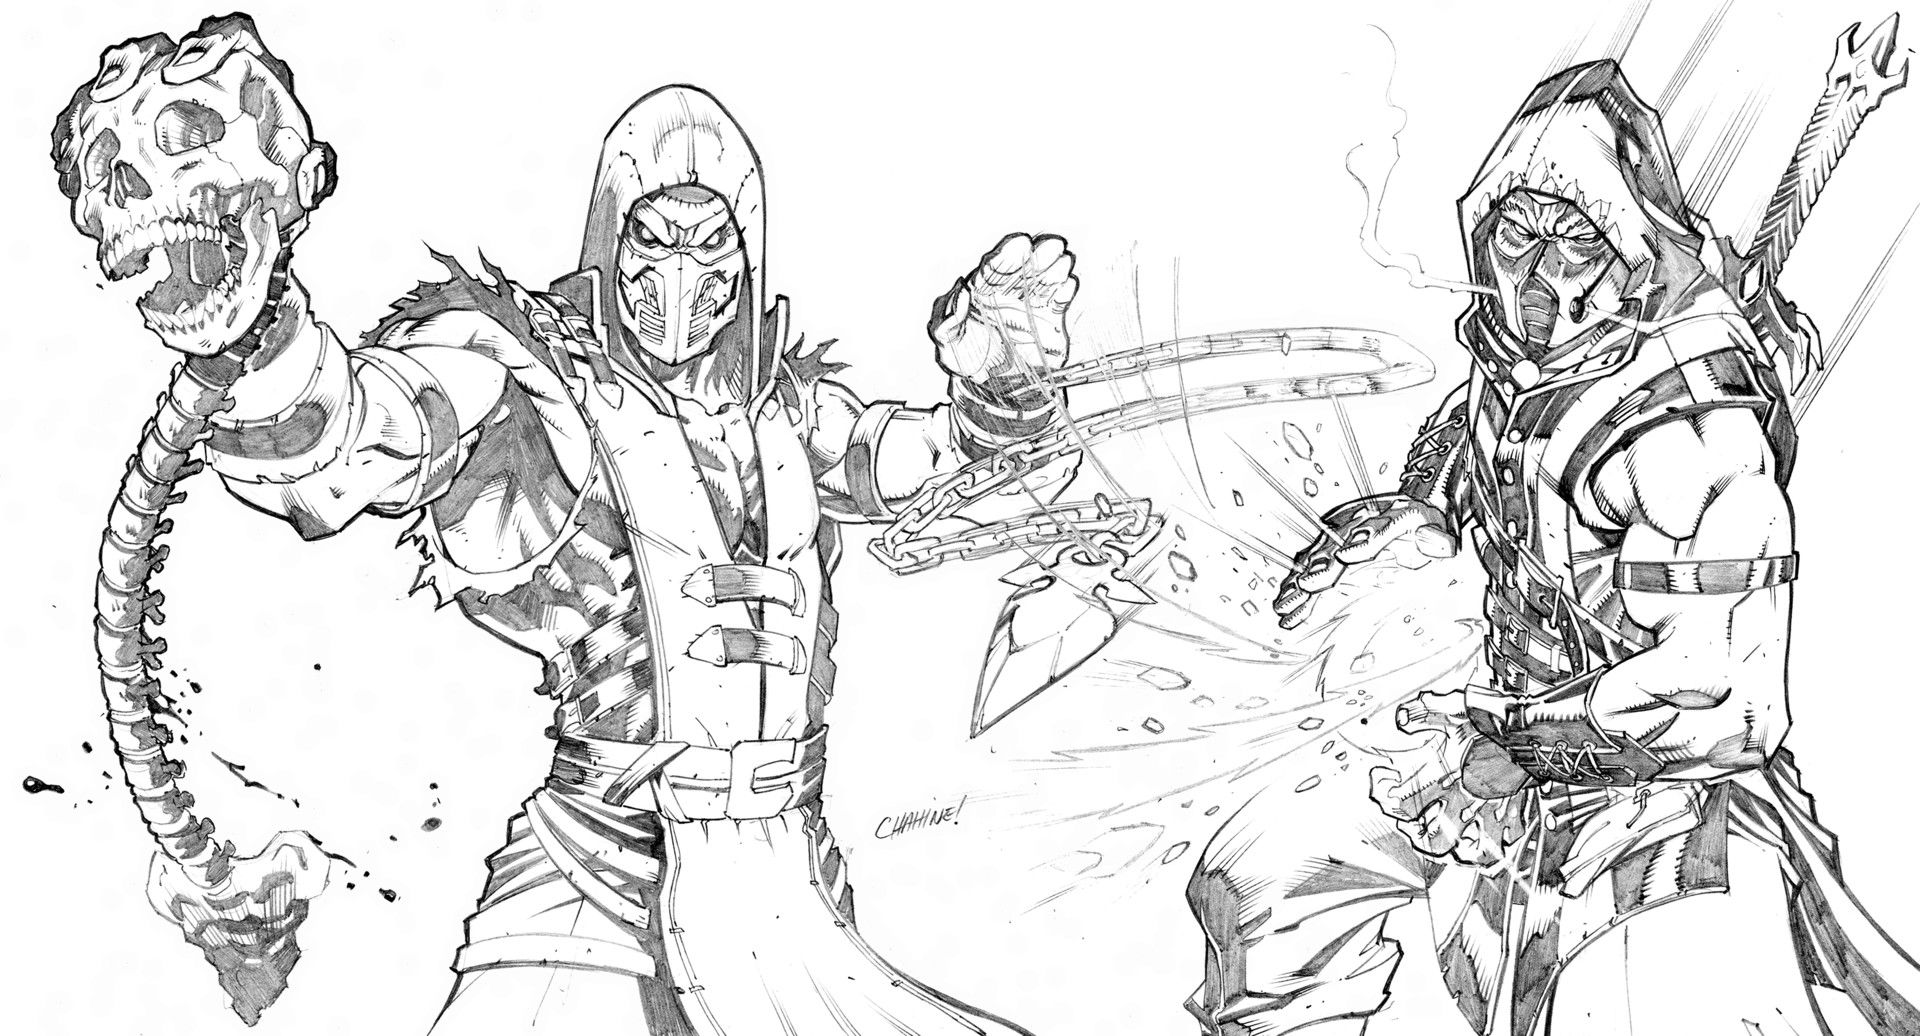 персонажи из мортал комбат х карандашом для тюльпана